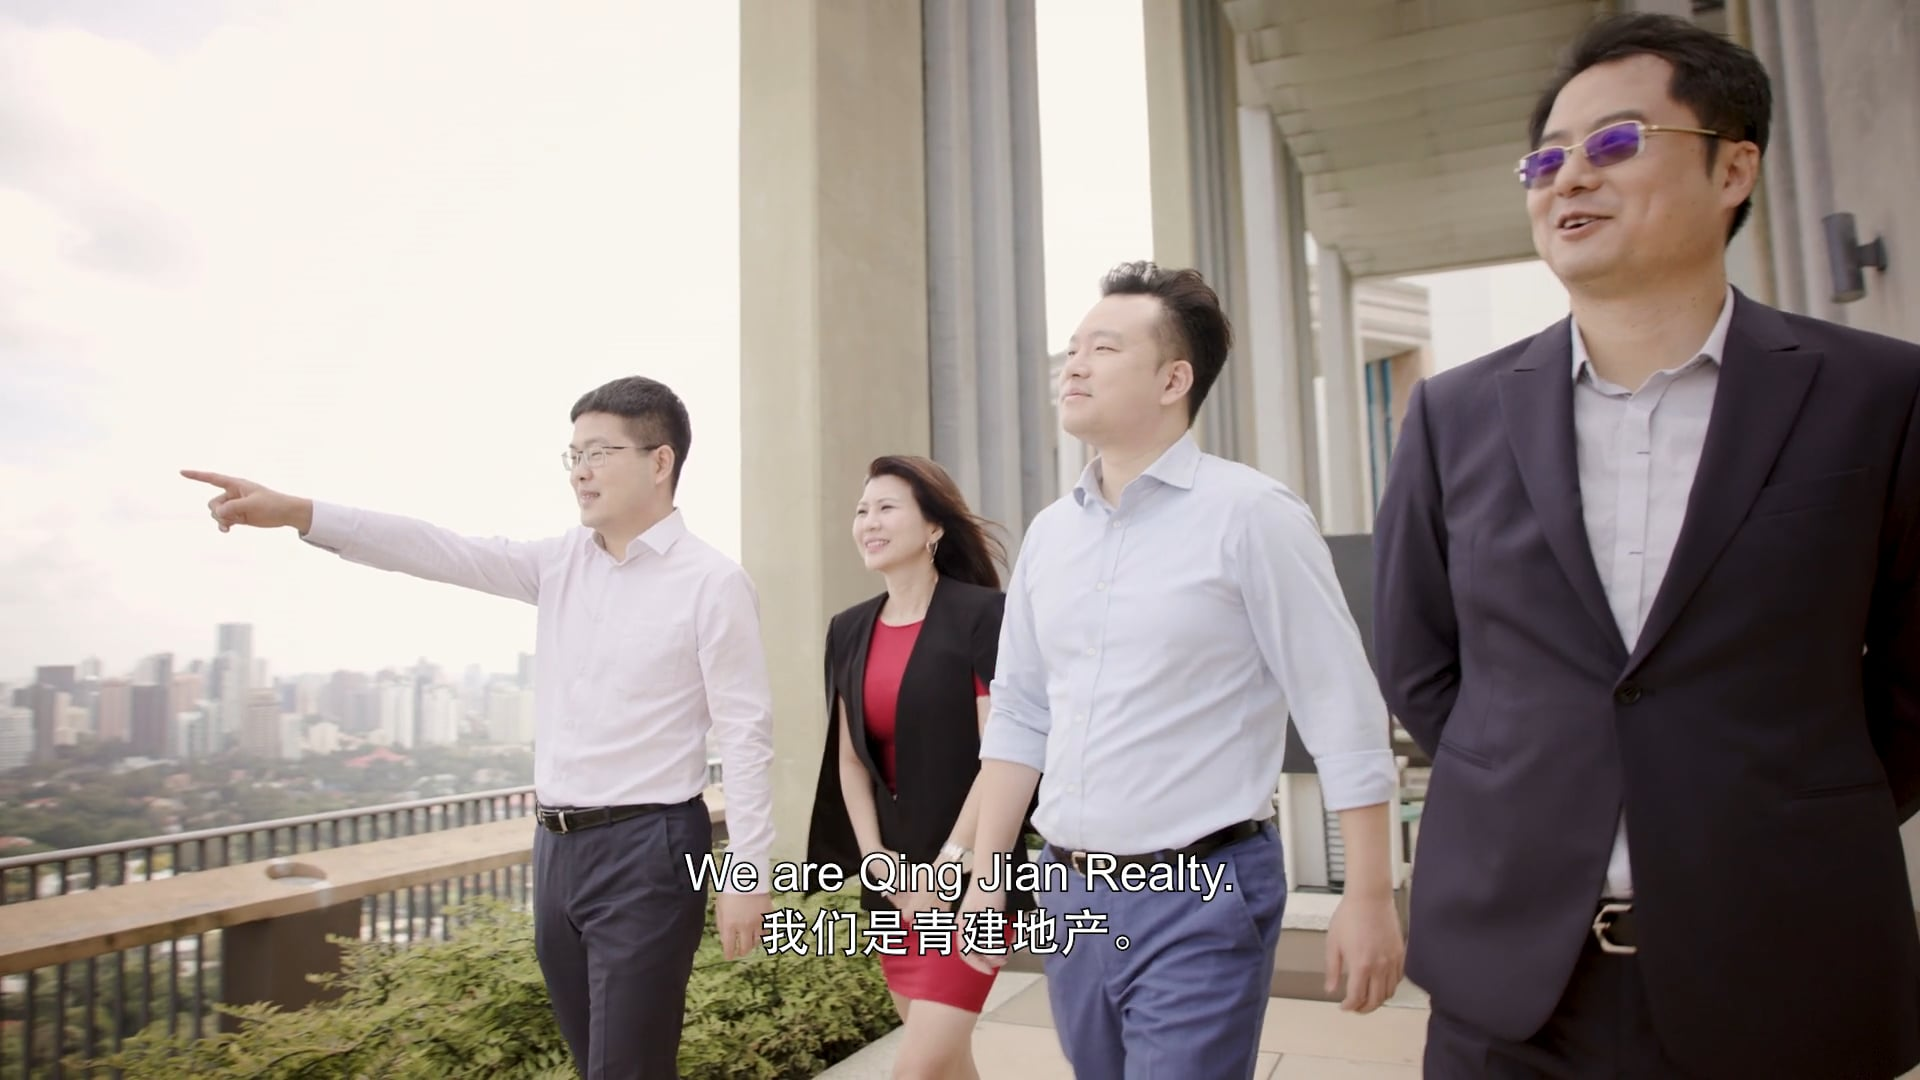 QingJian Realty Corporate Video Singapore